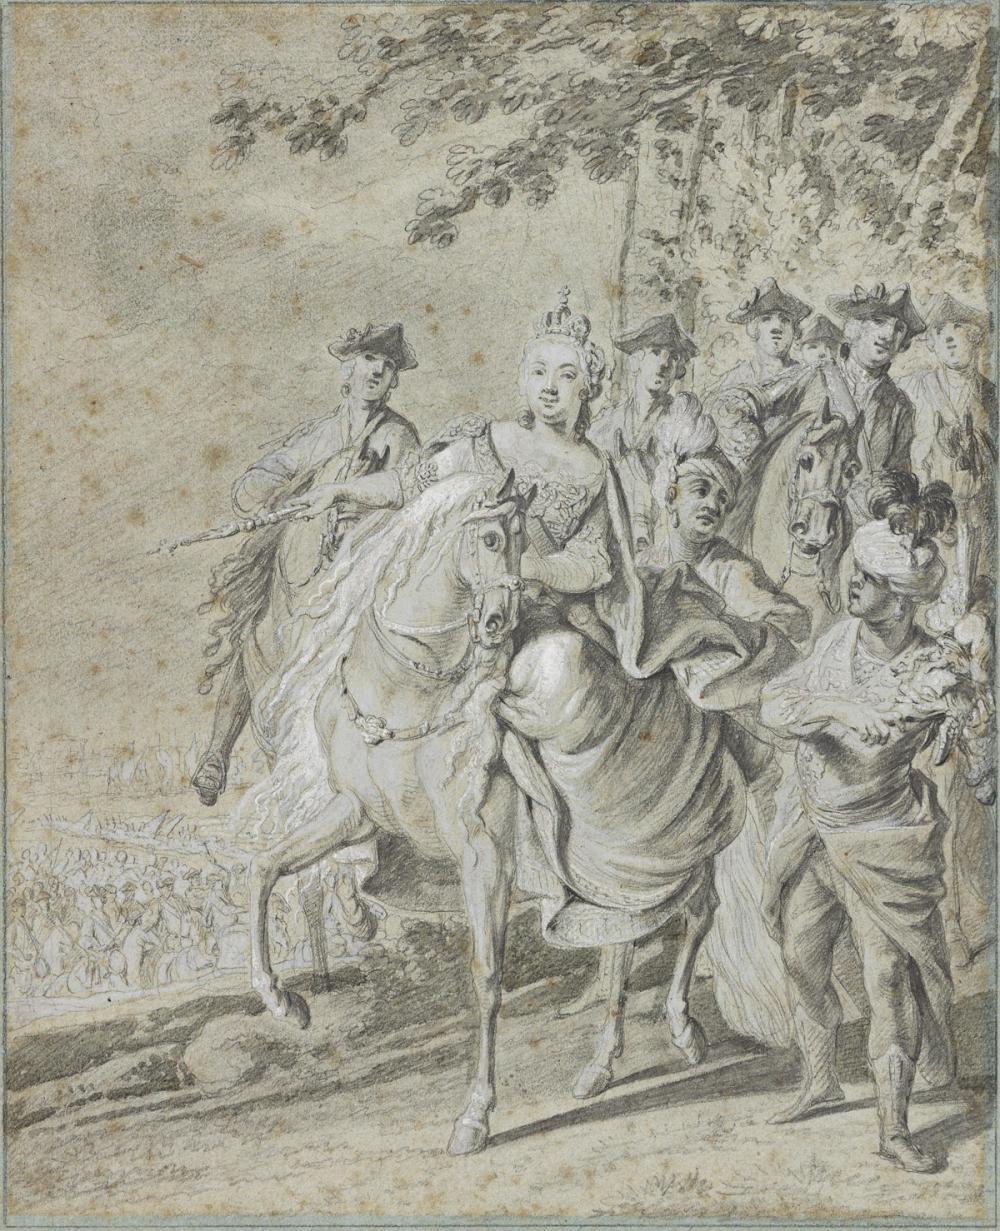 JOHANN ELIAS RIDINGER (Ulm 1698-1767 Augsburg) Group of 4 portraits of aristocrats on horseback.